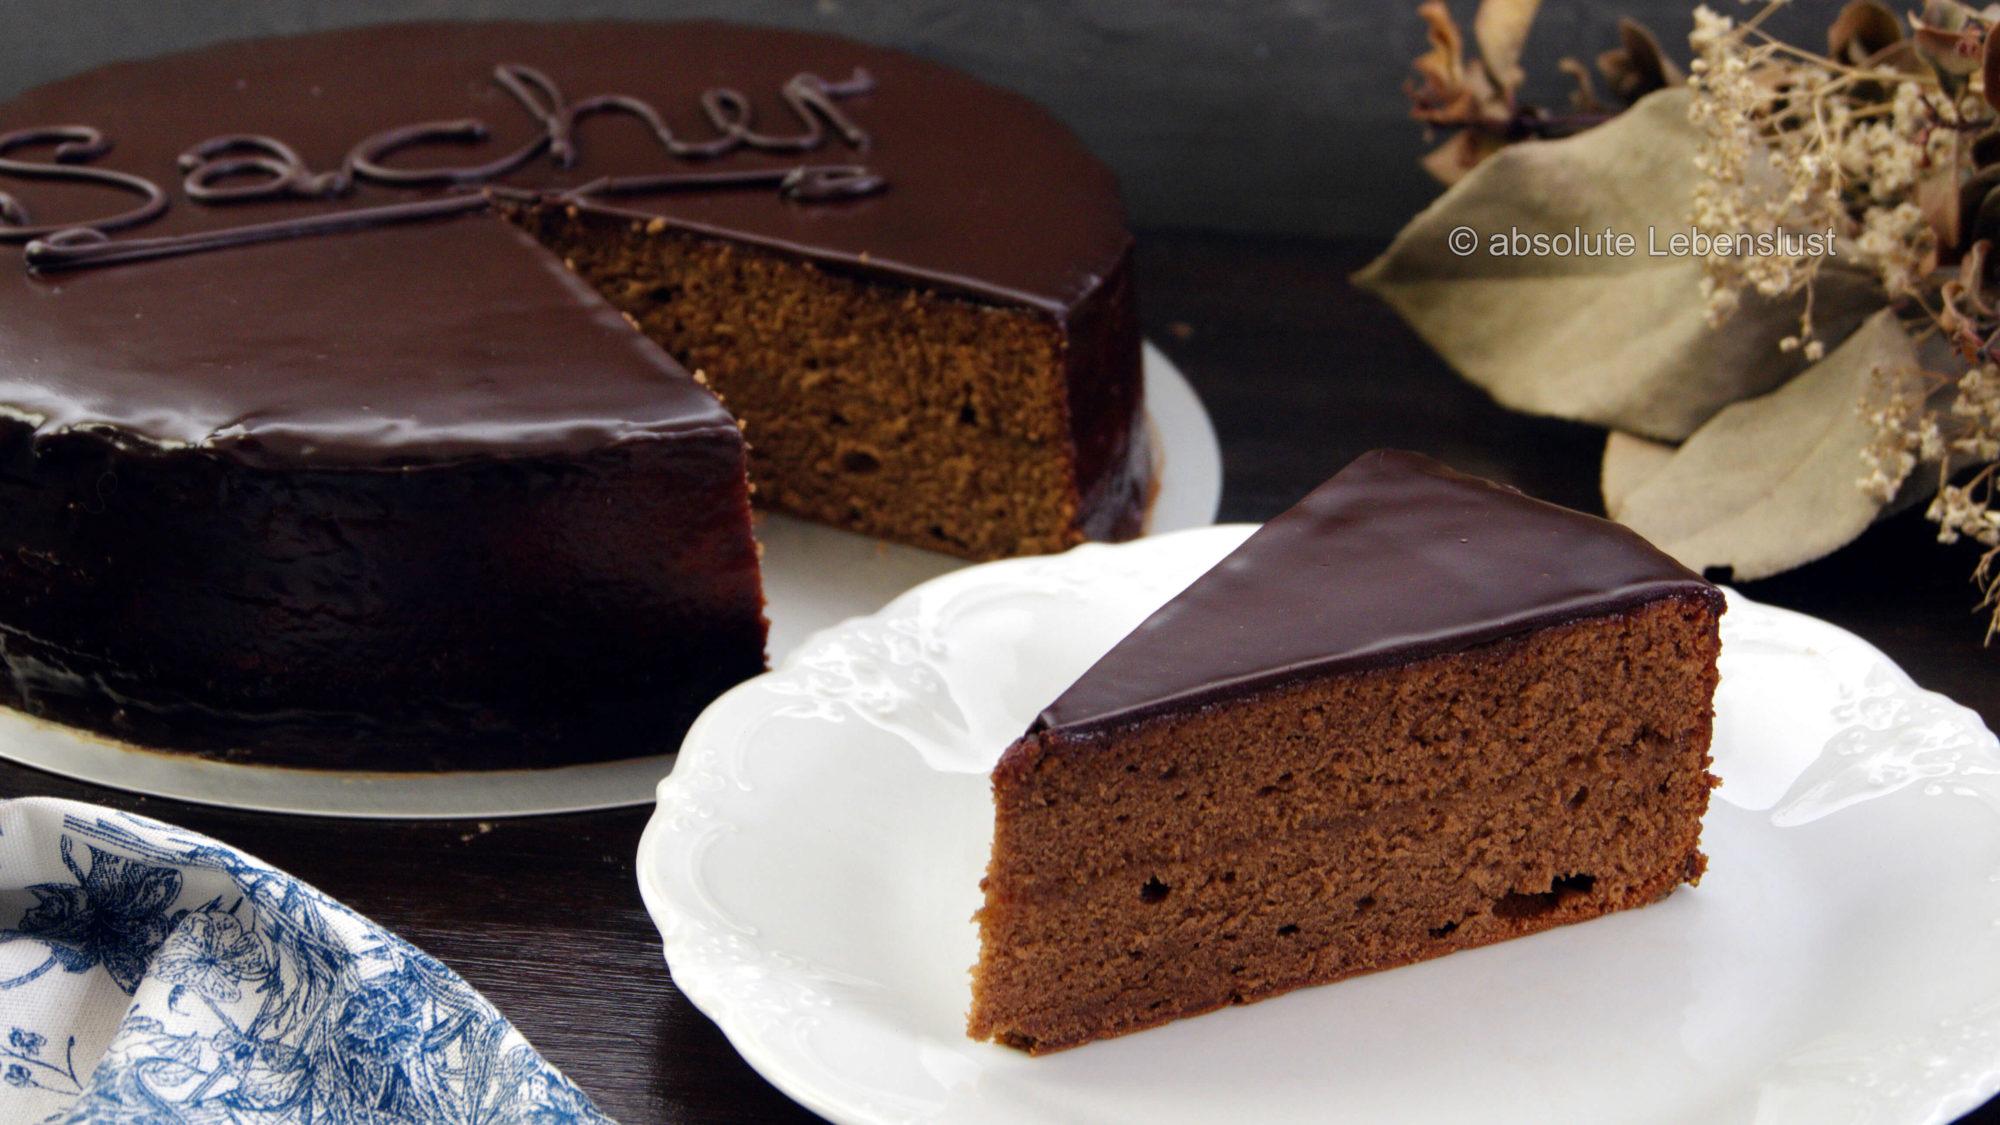 sachertorte backen, sachertorte selber machen, klassische torten, kalssische kuchen, tortenklassiker, original, sachertorte